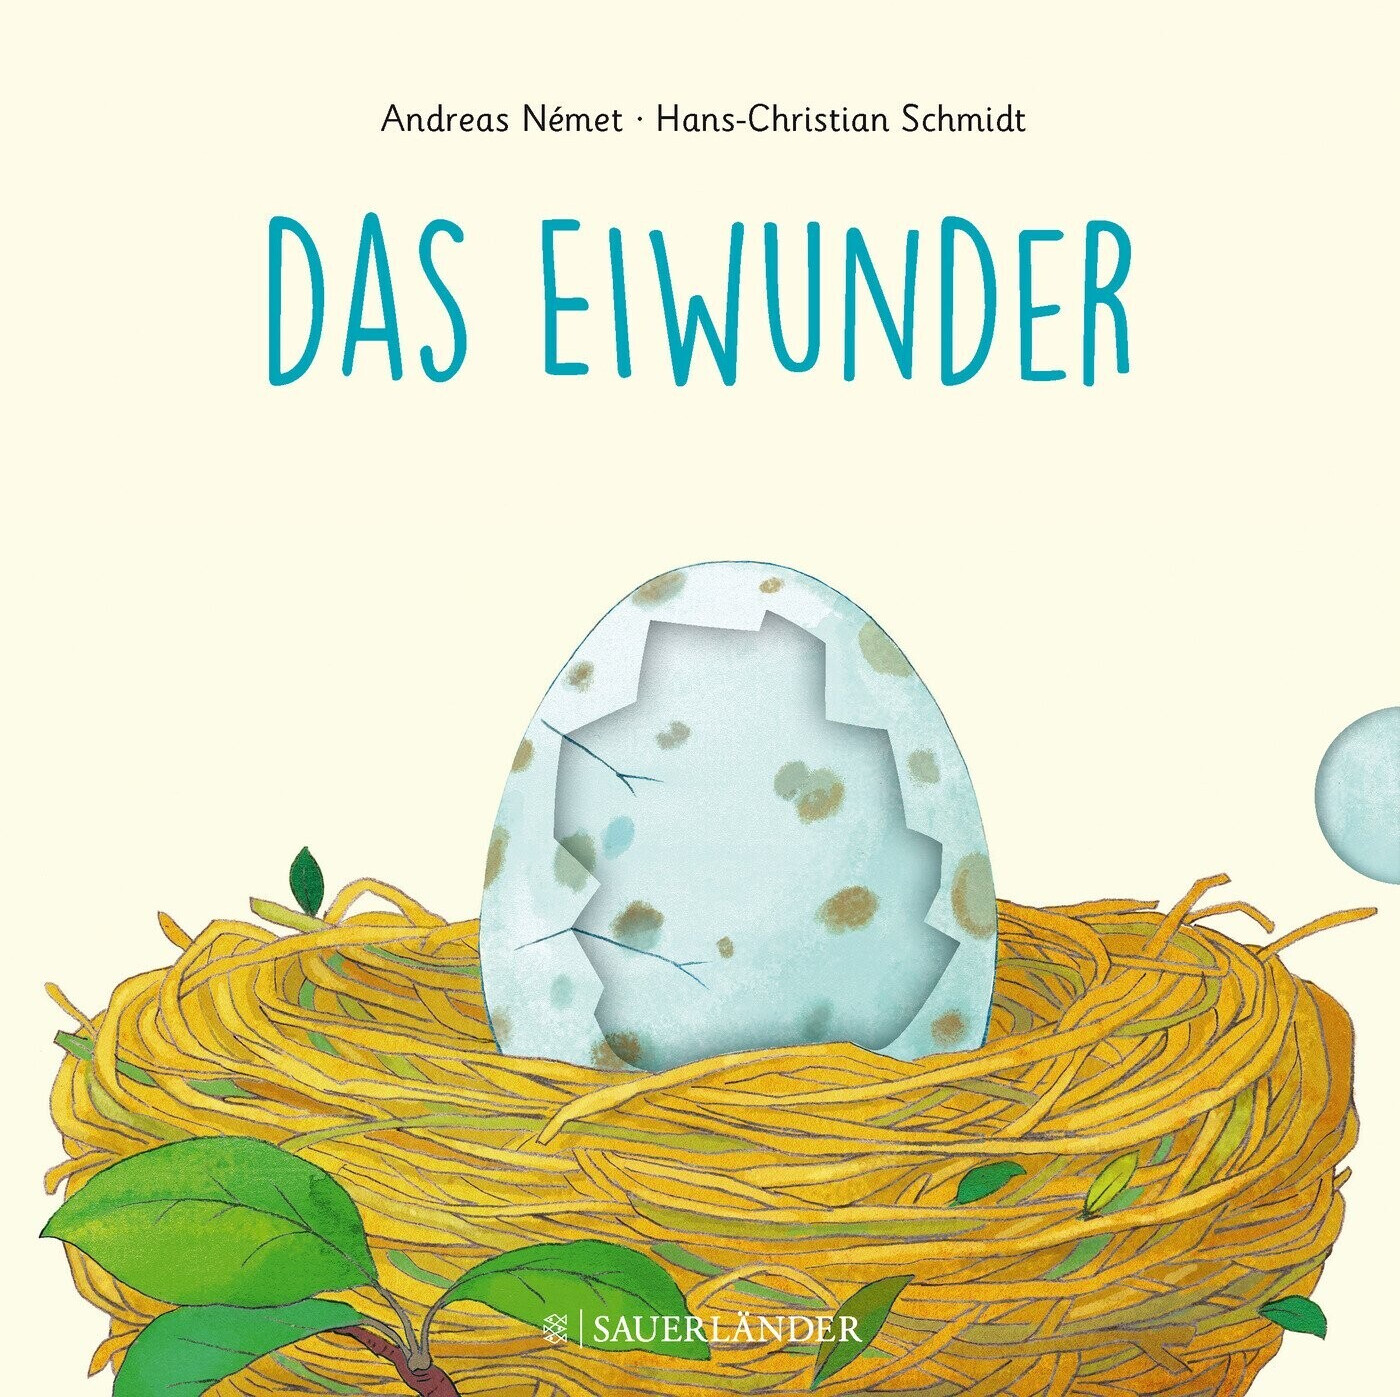 Das Eiwunder (Hans-Christian Schmidt)